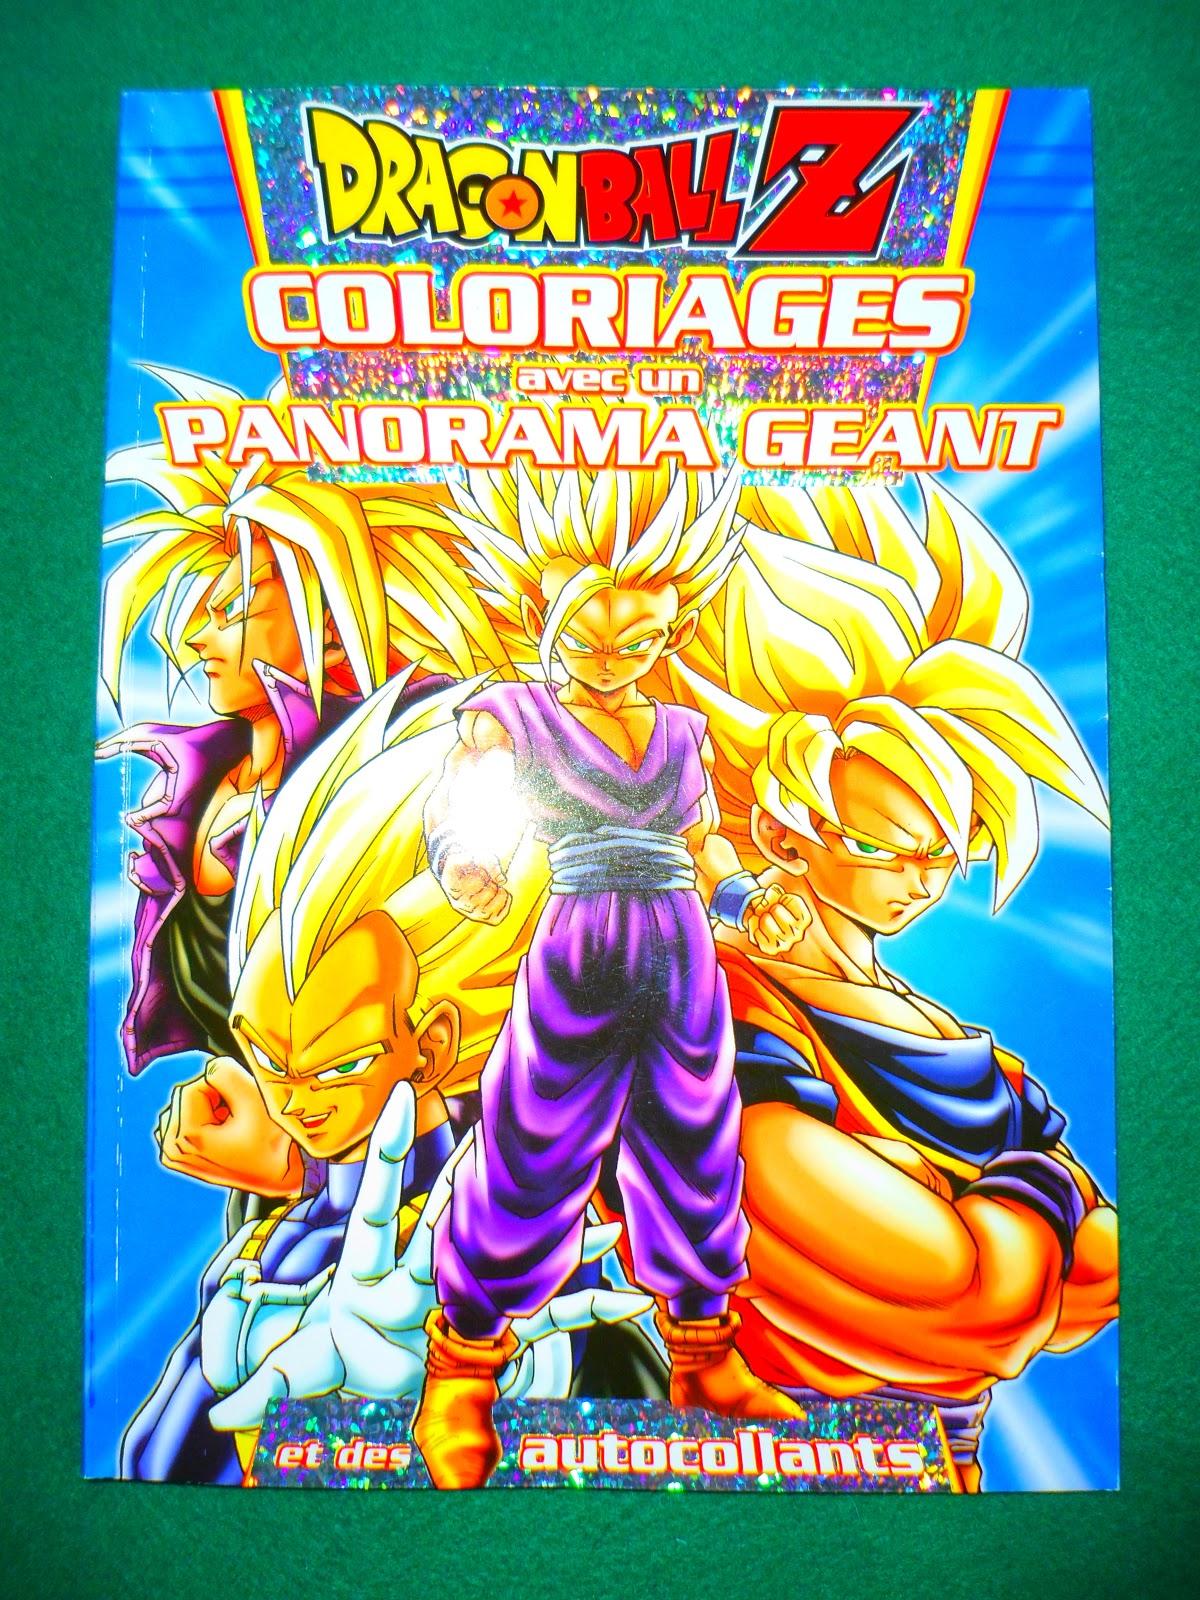 Dragon Ball Z Coloriages avec Panorama Géant